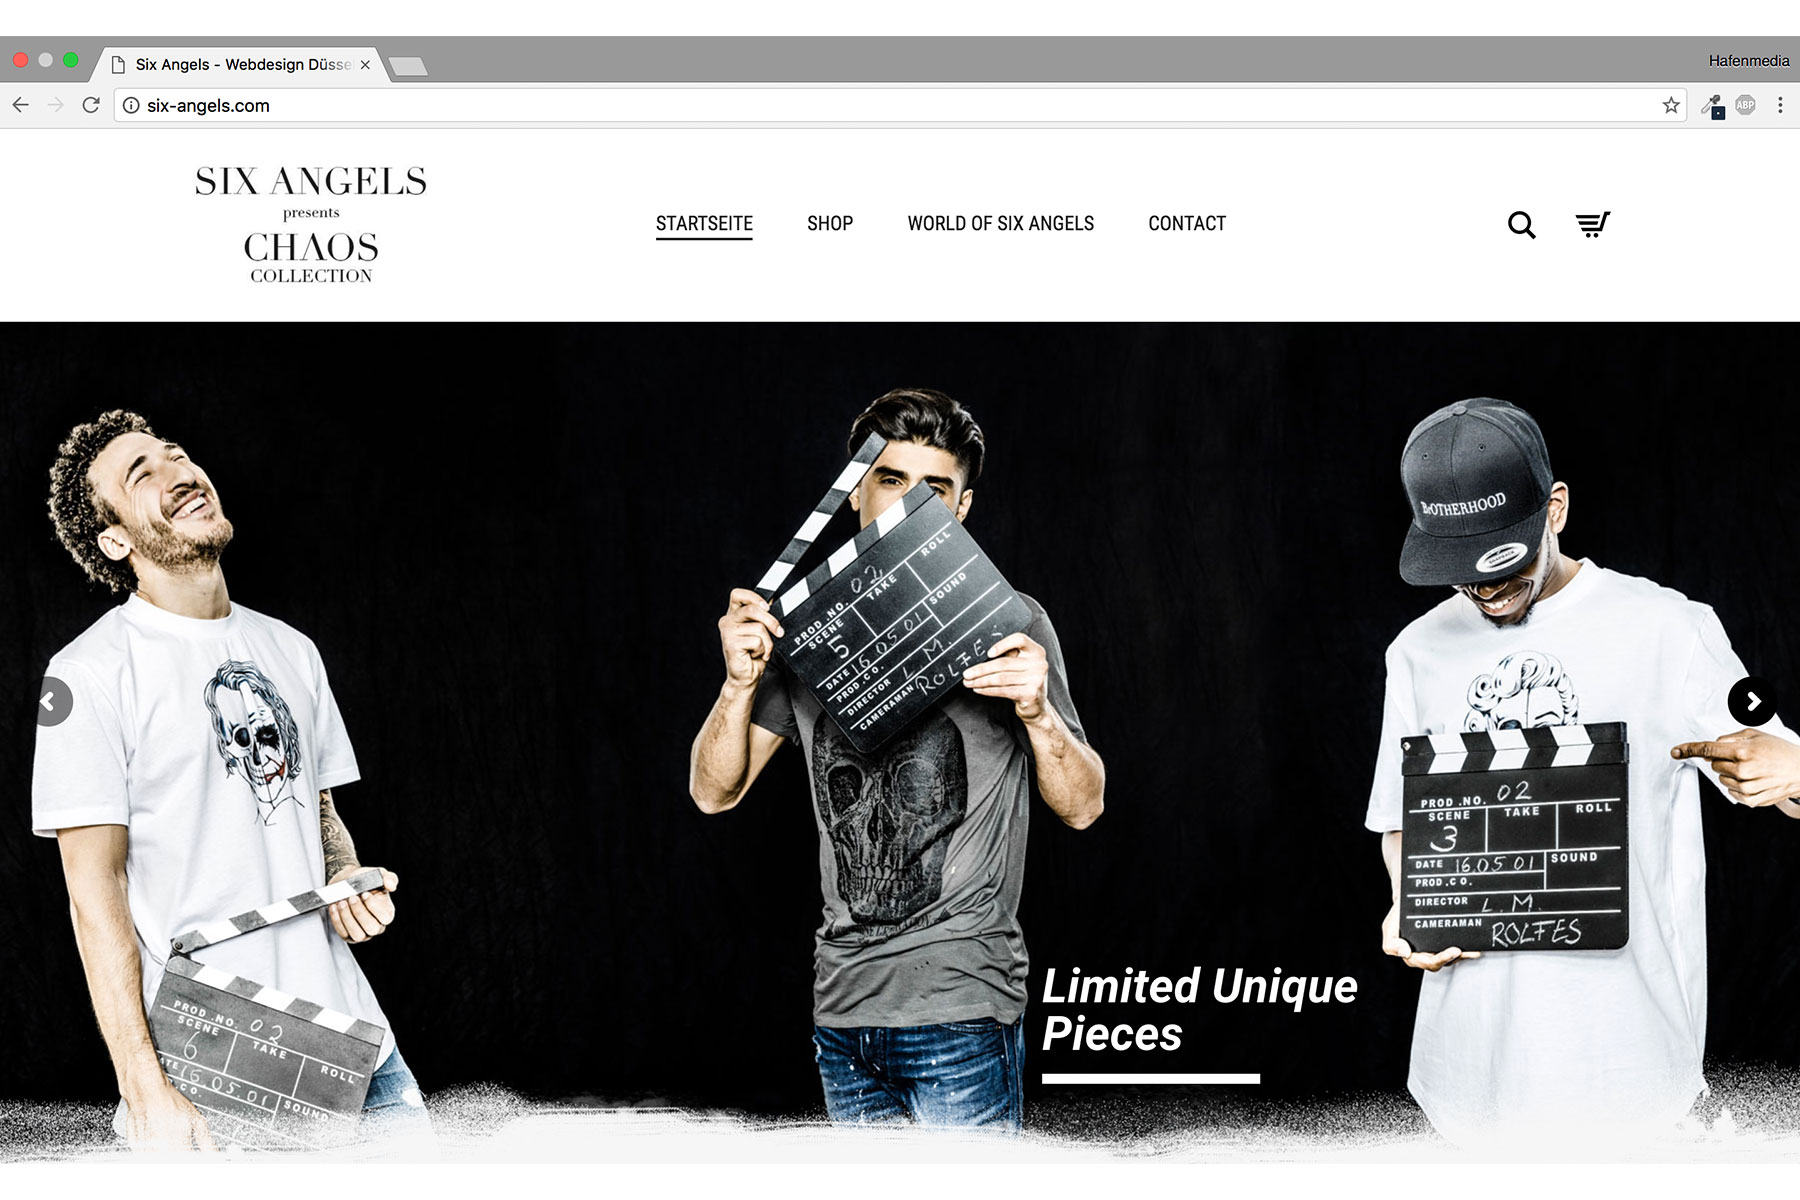 webdesign-duesseldorf-hafenmedia-six-angels-porfolio4